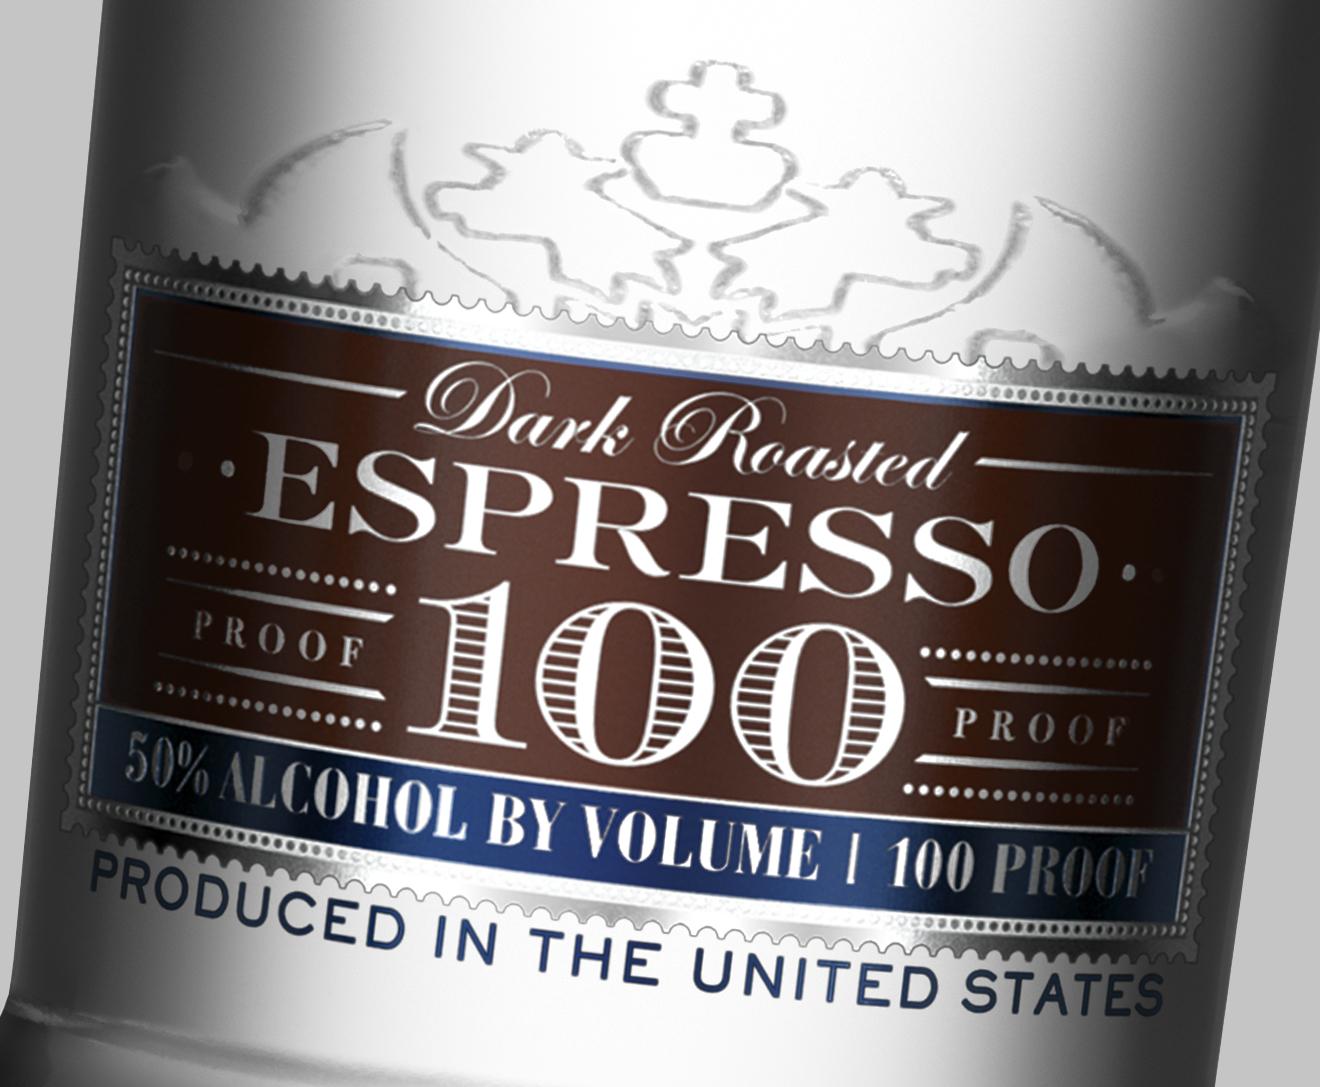 smirnoff 100 proof vodka espresso flavor footer label design detail